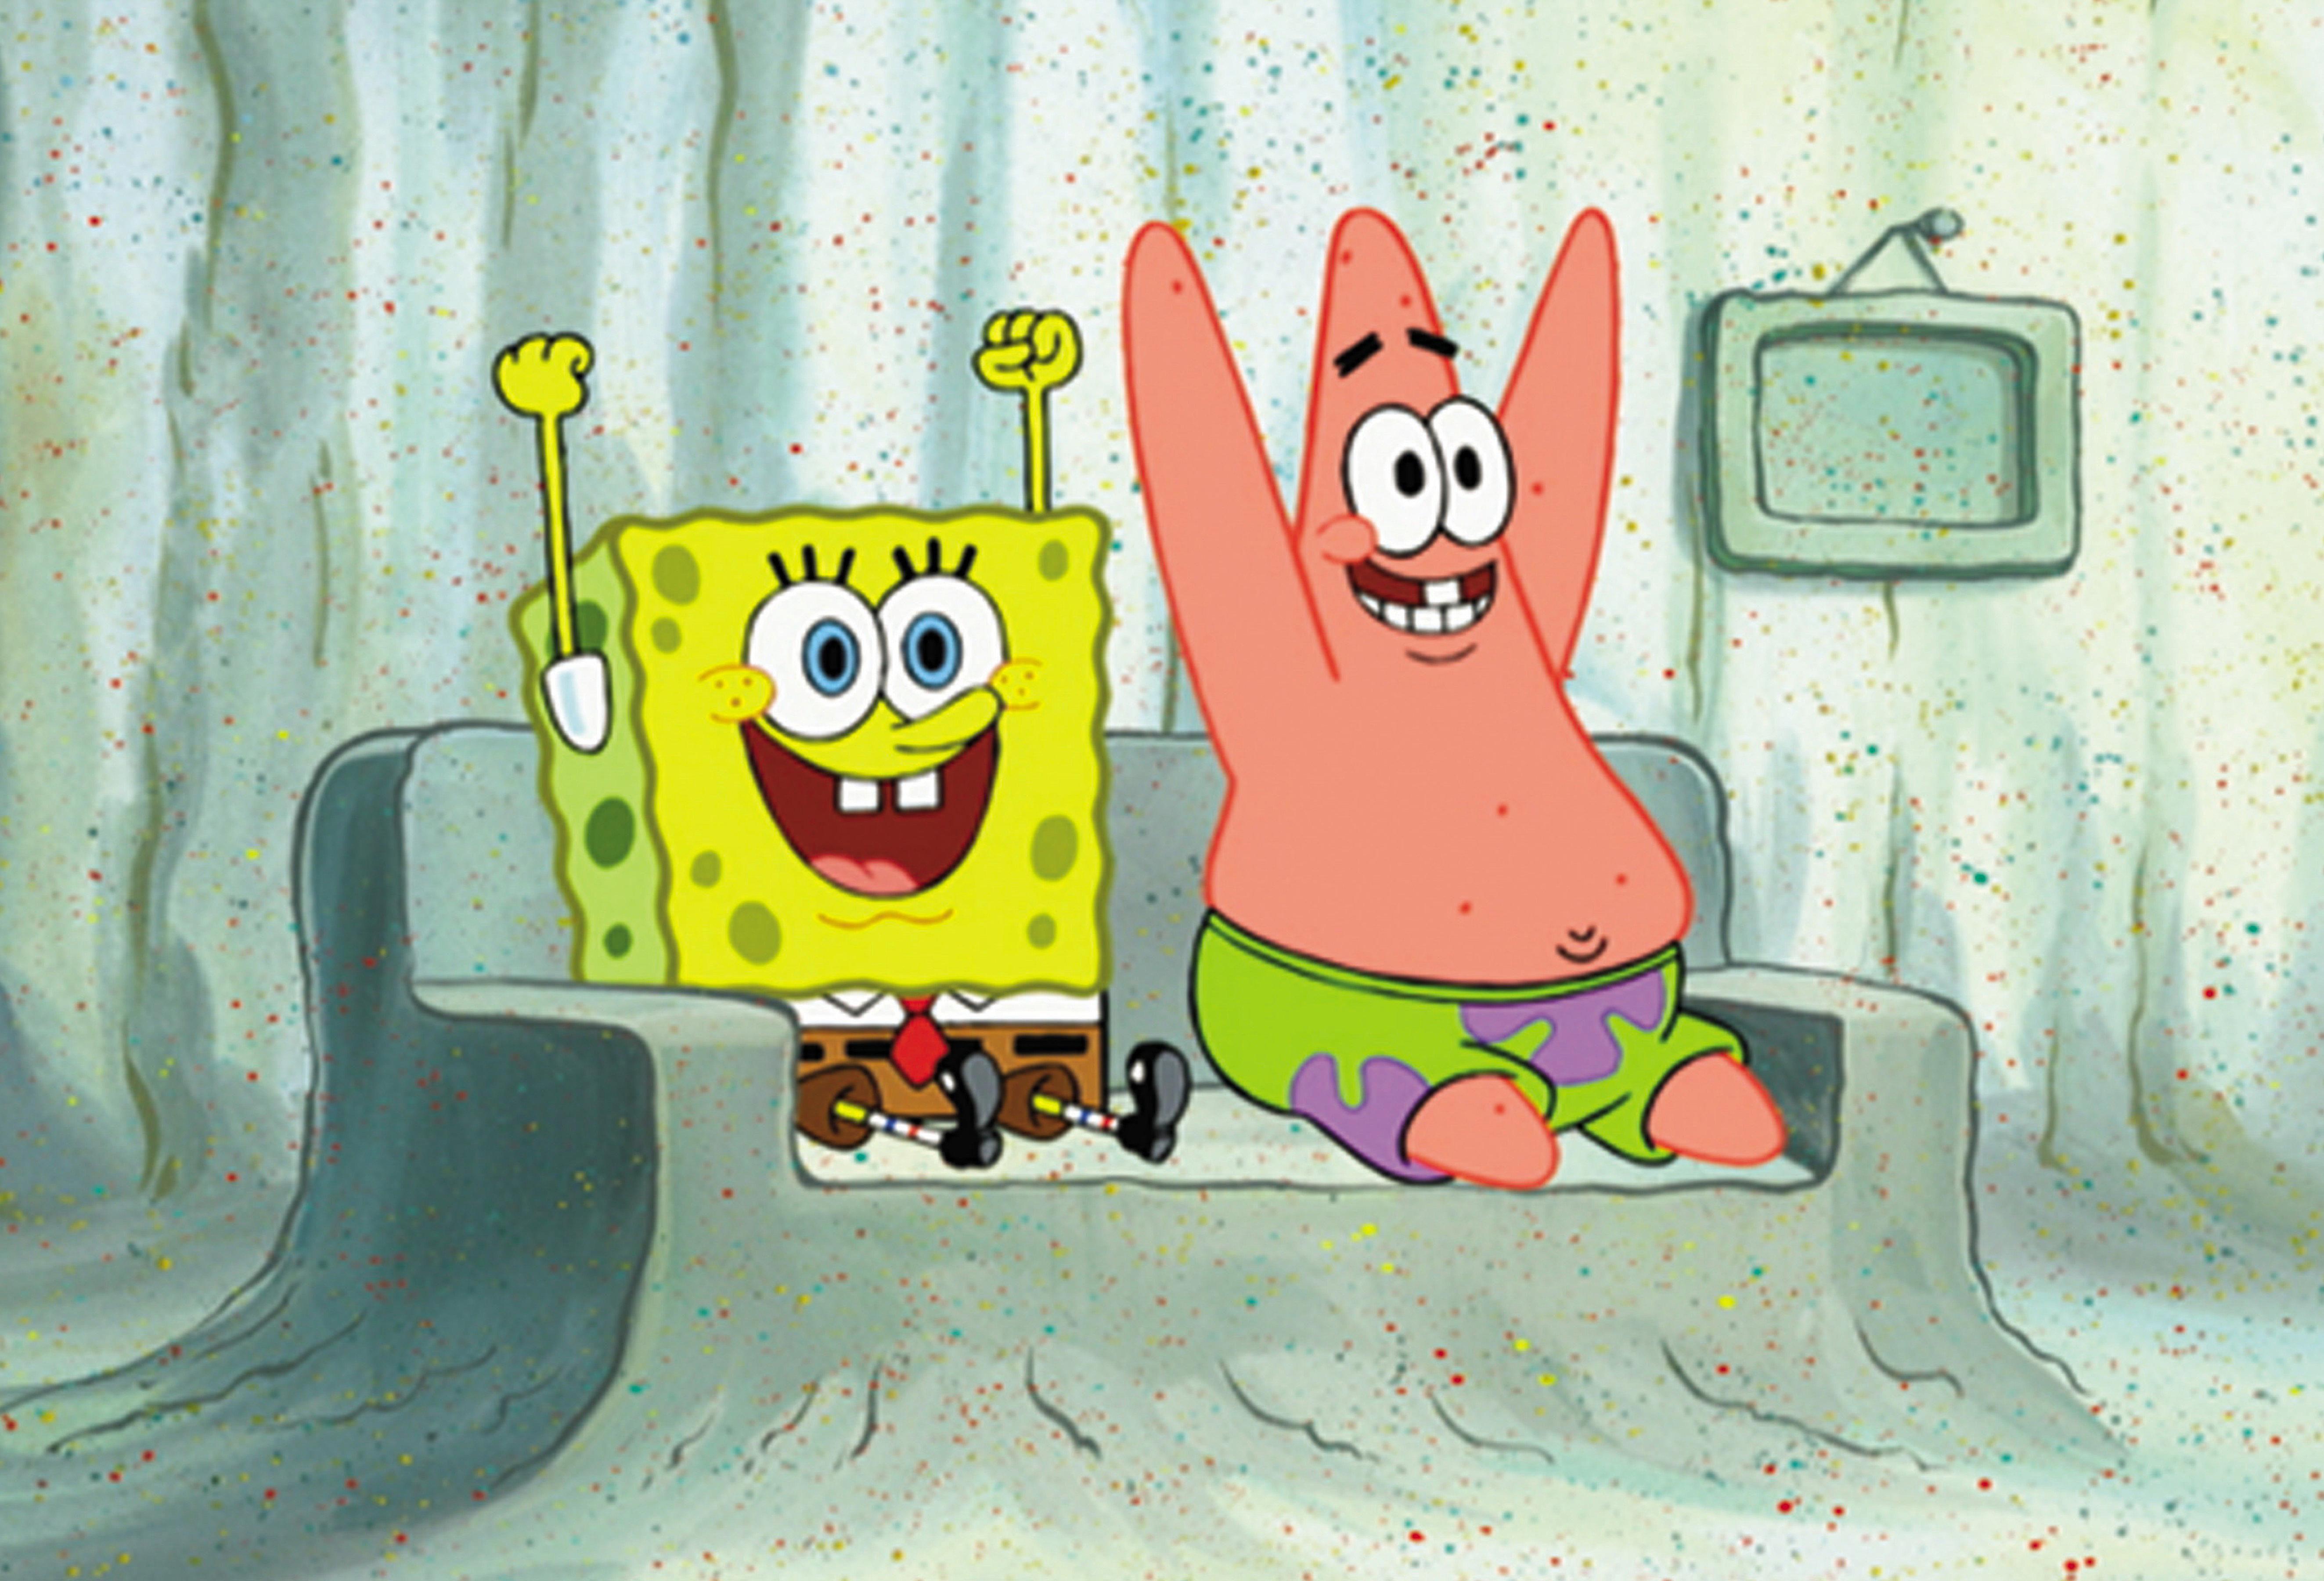 SpongeBob SquarePants. SpongeBob and Patrick